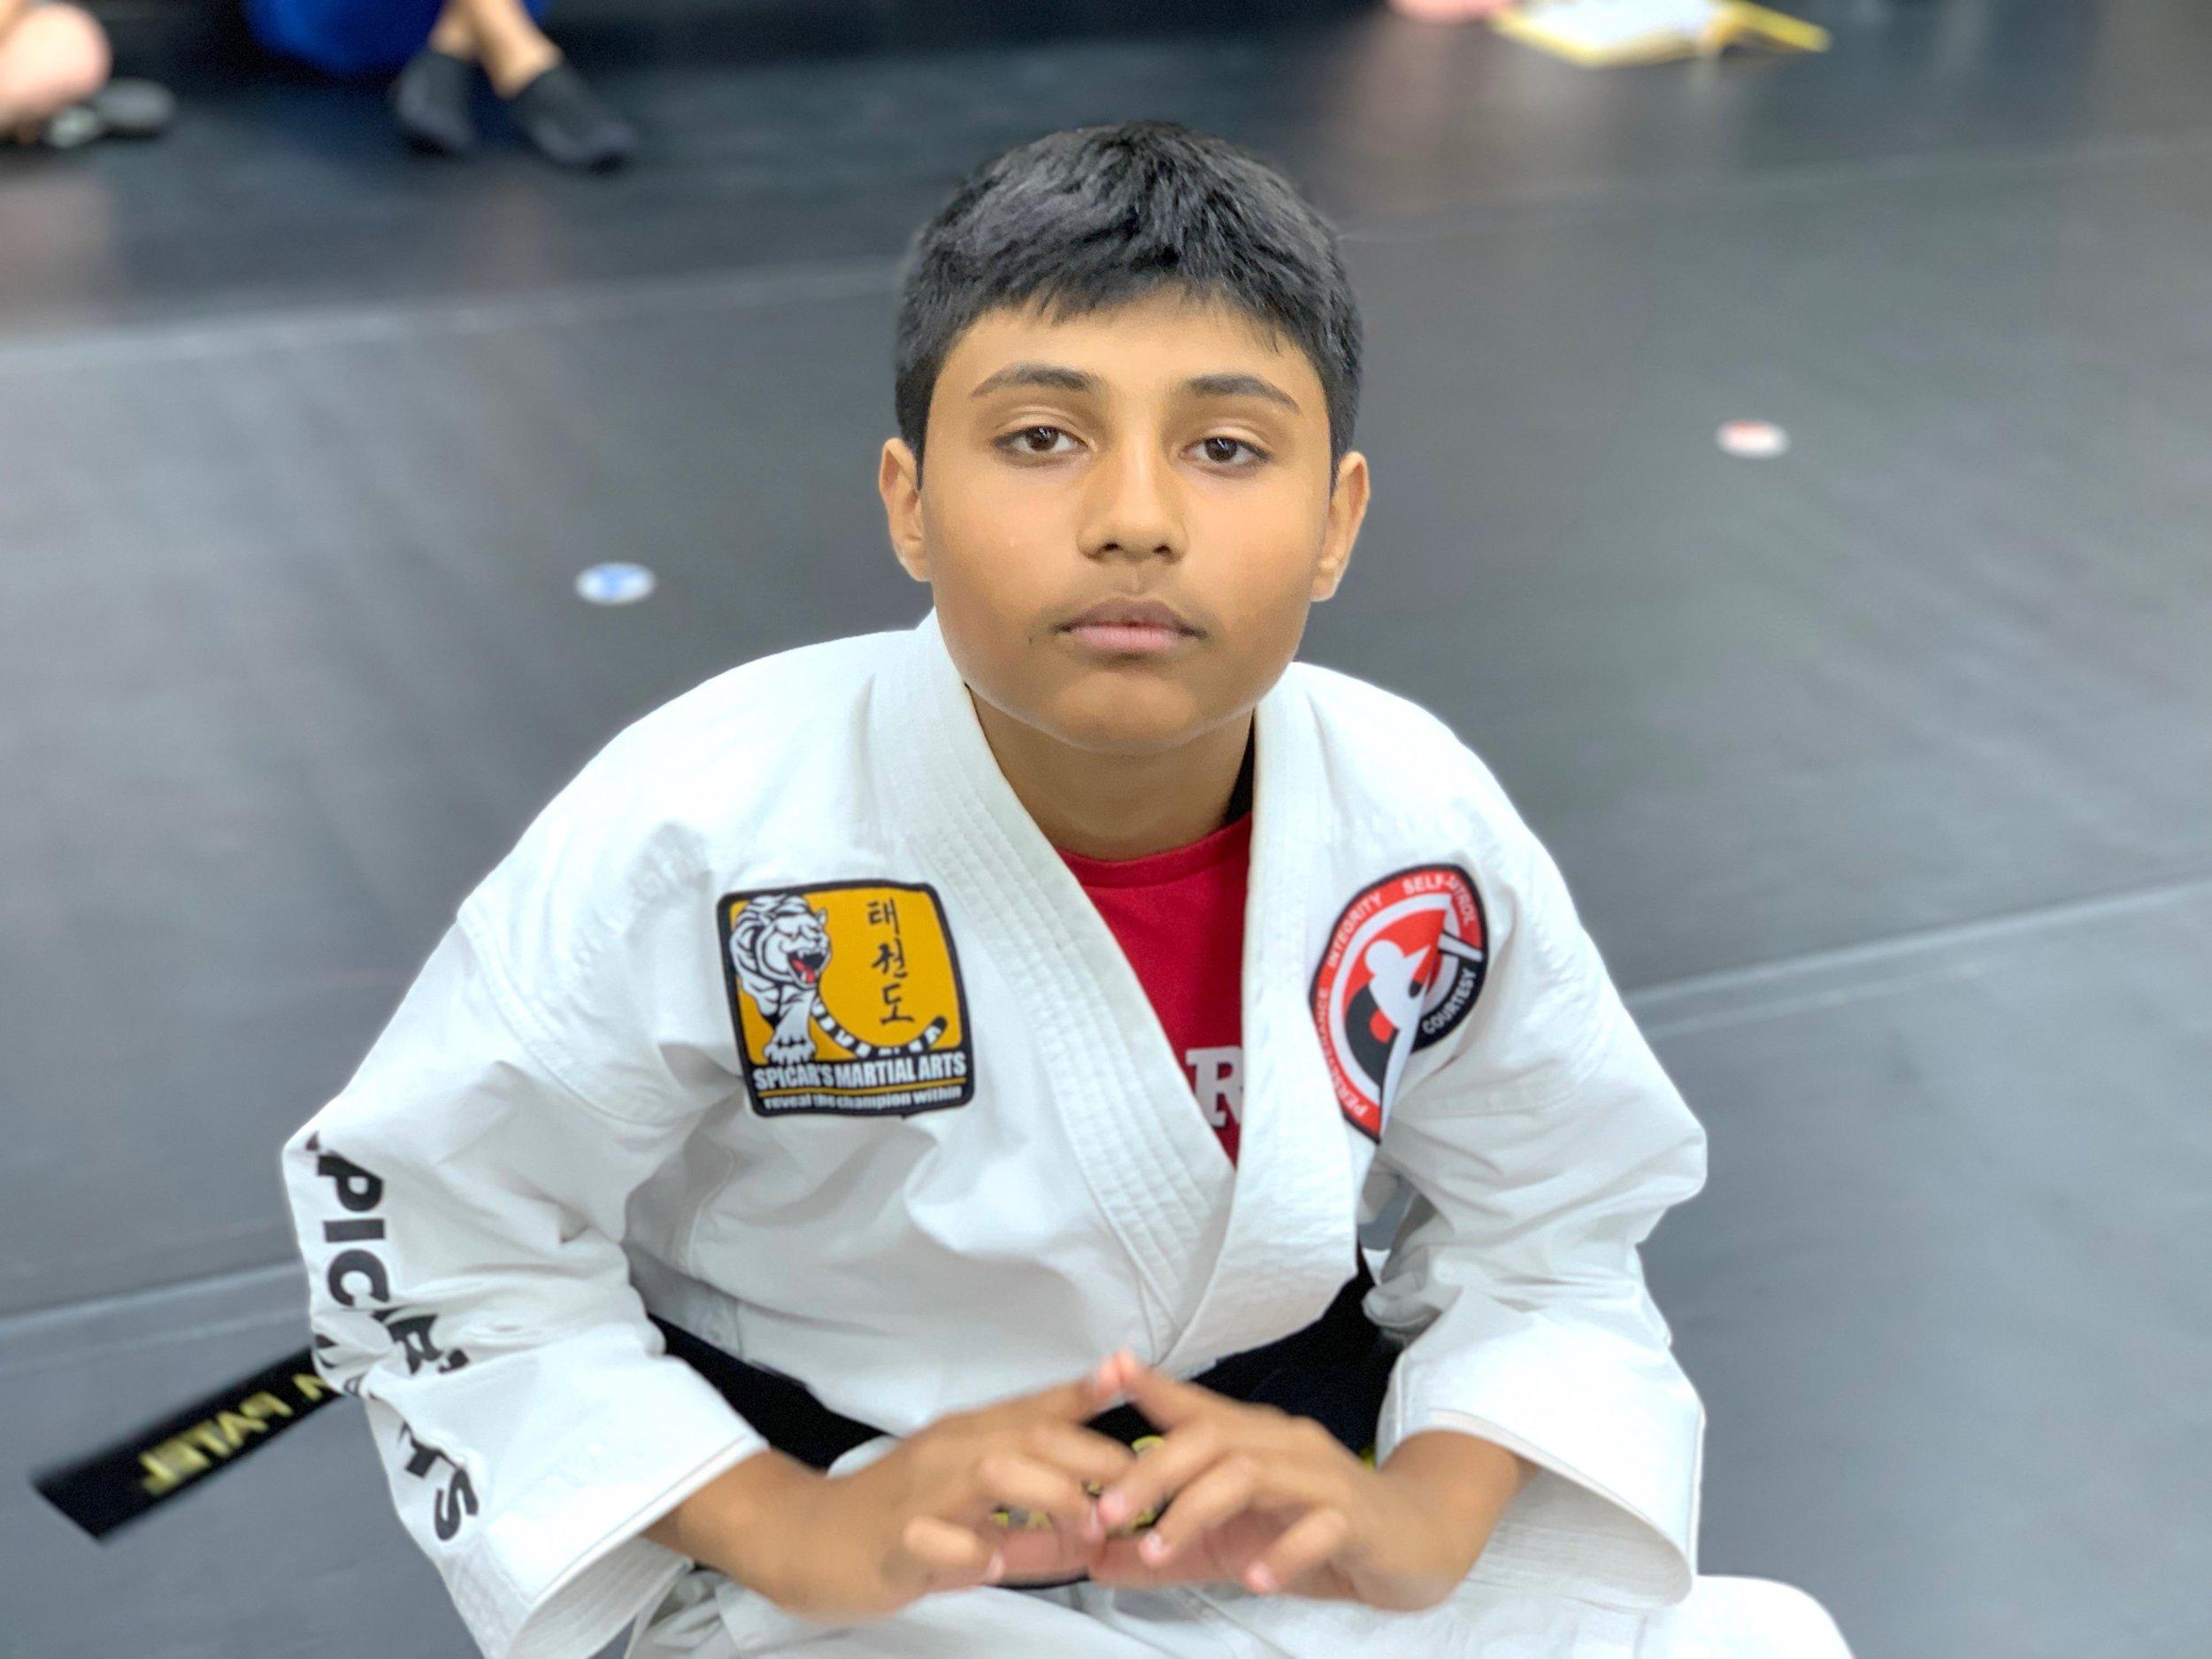 karate-kids-program-souhtlake-keller-grapevine-texas00012.jpeg